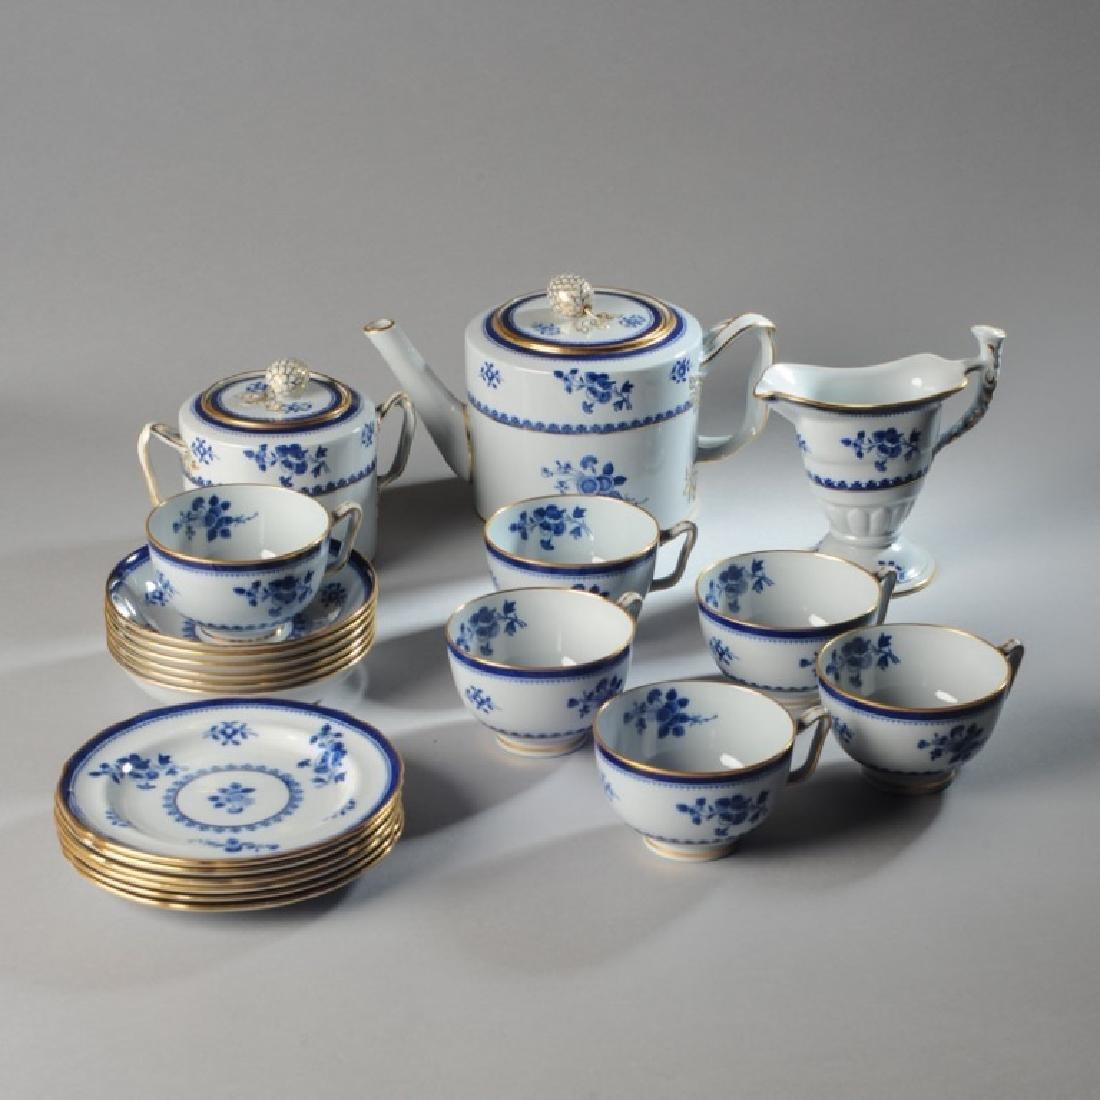 Copeland Spode Lowestoft Style Tea Set